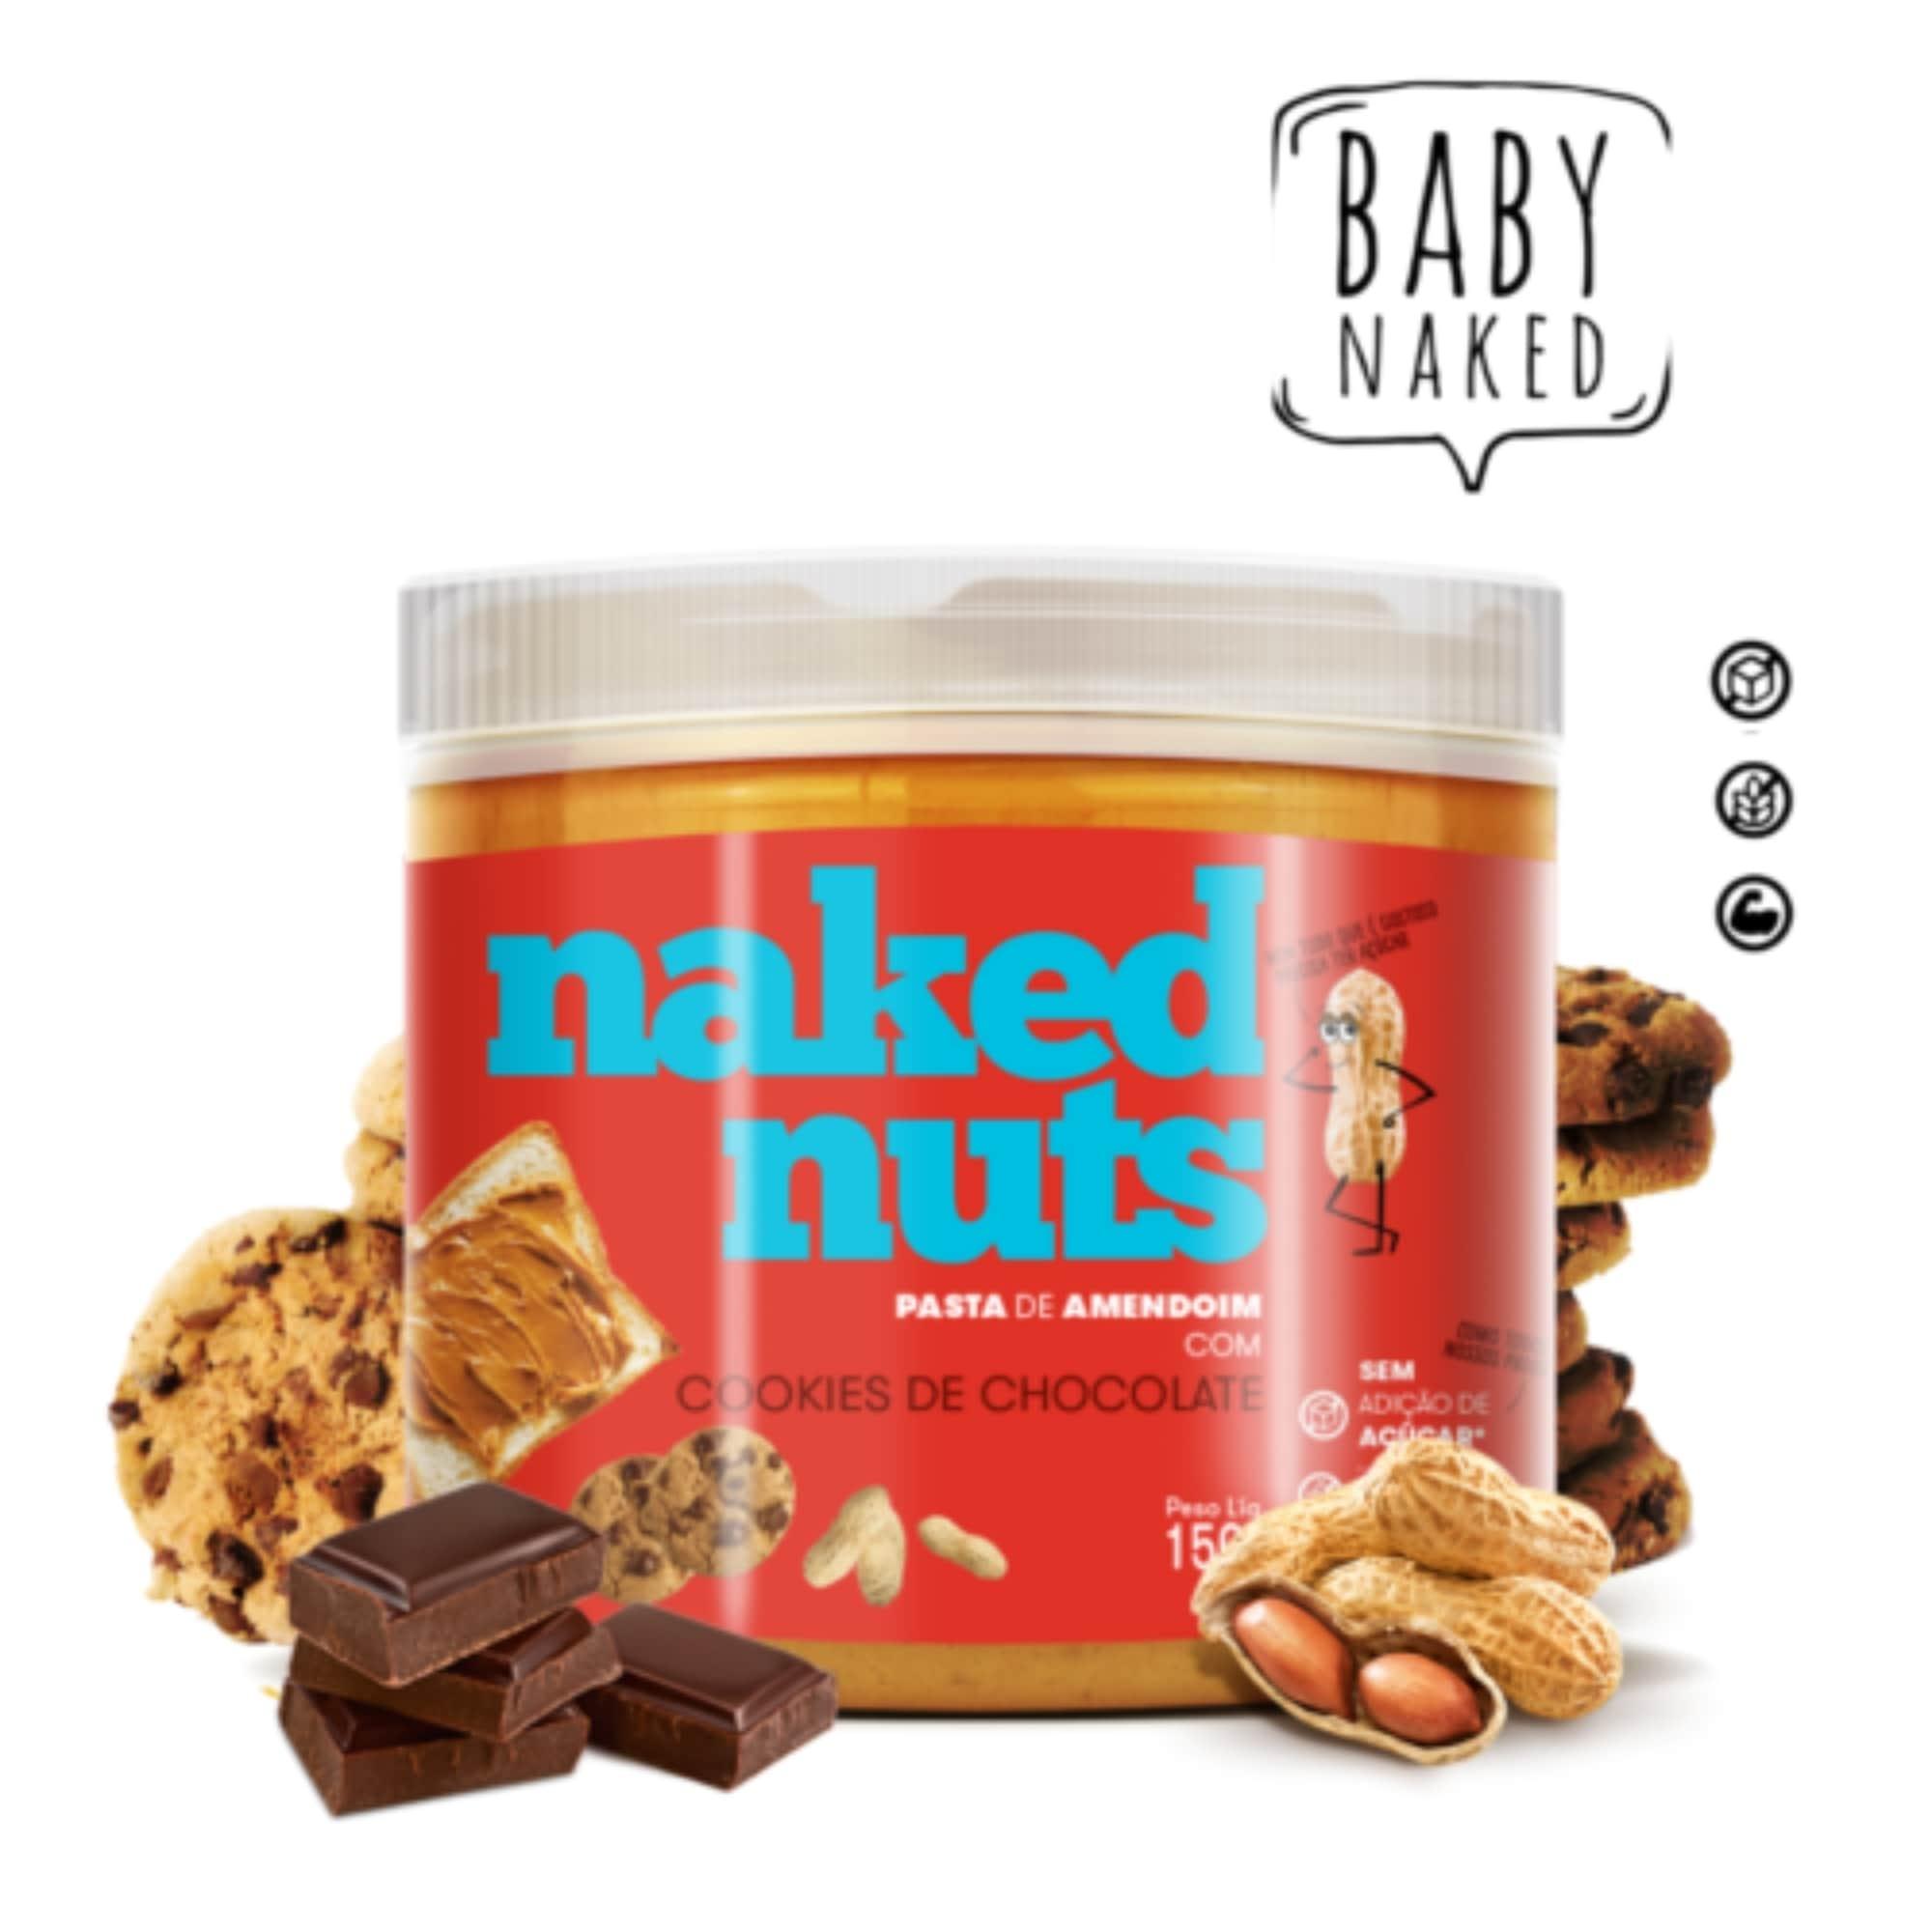 Kit C/ 5 Unidades De Pastas Naked Nuts